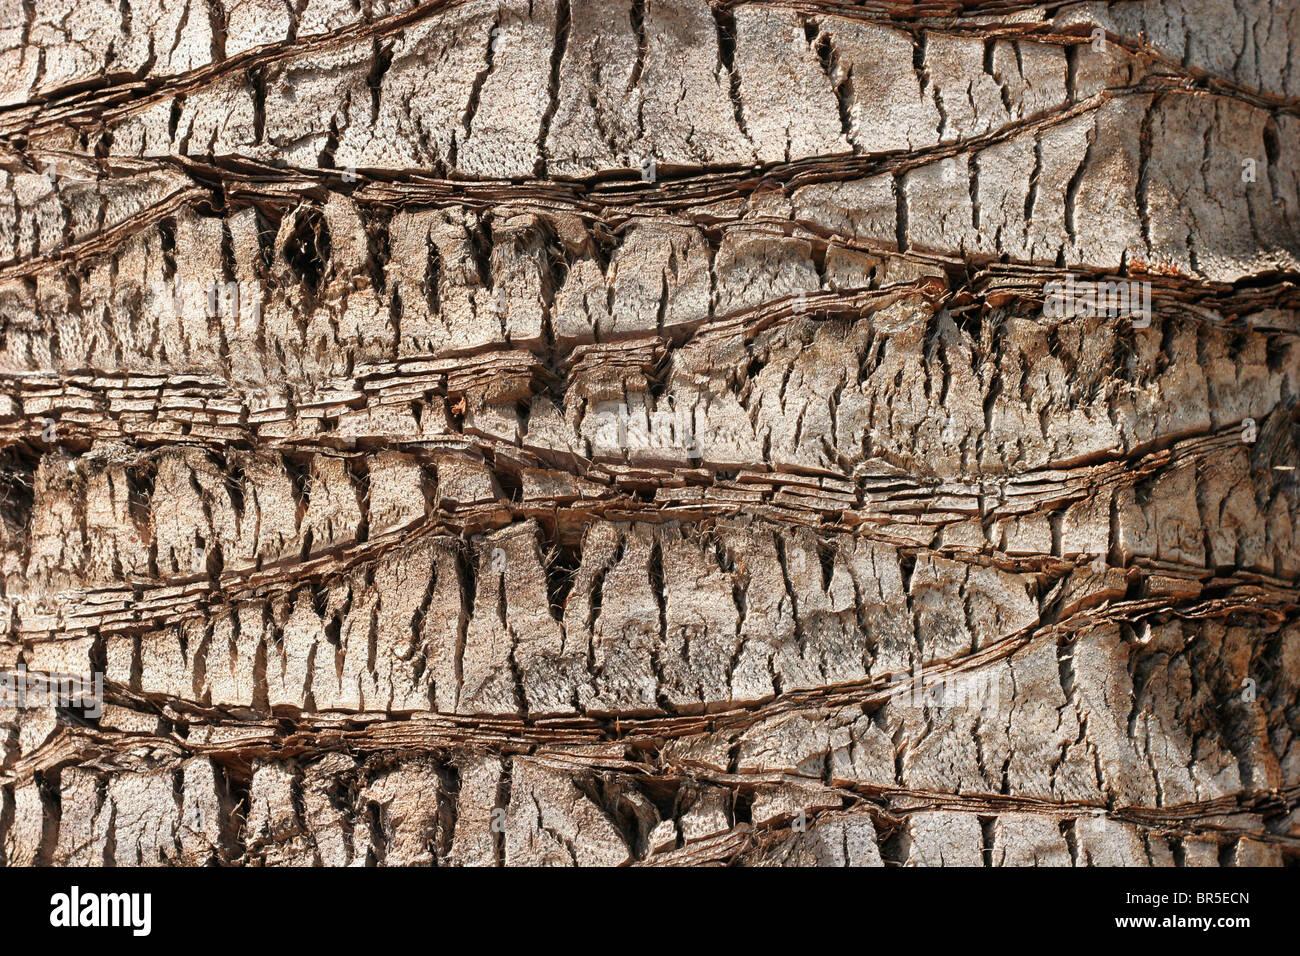 WENDY: The bark